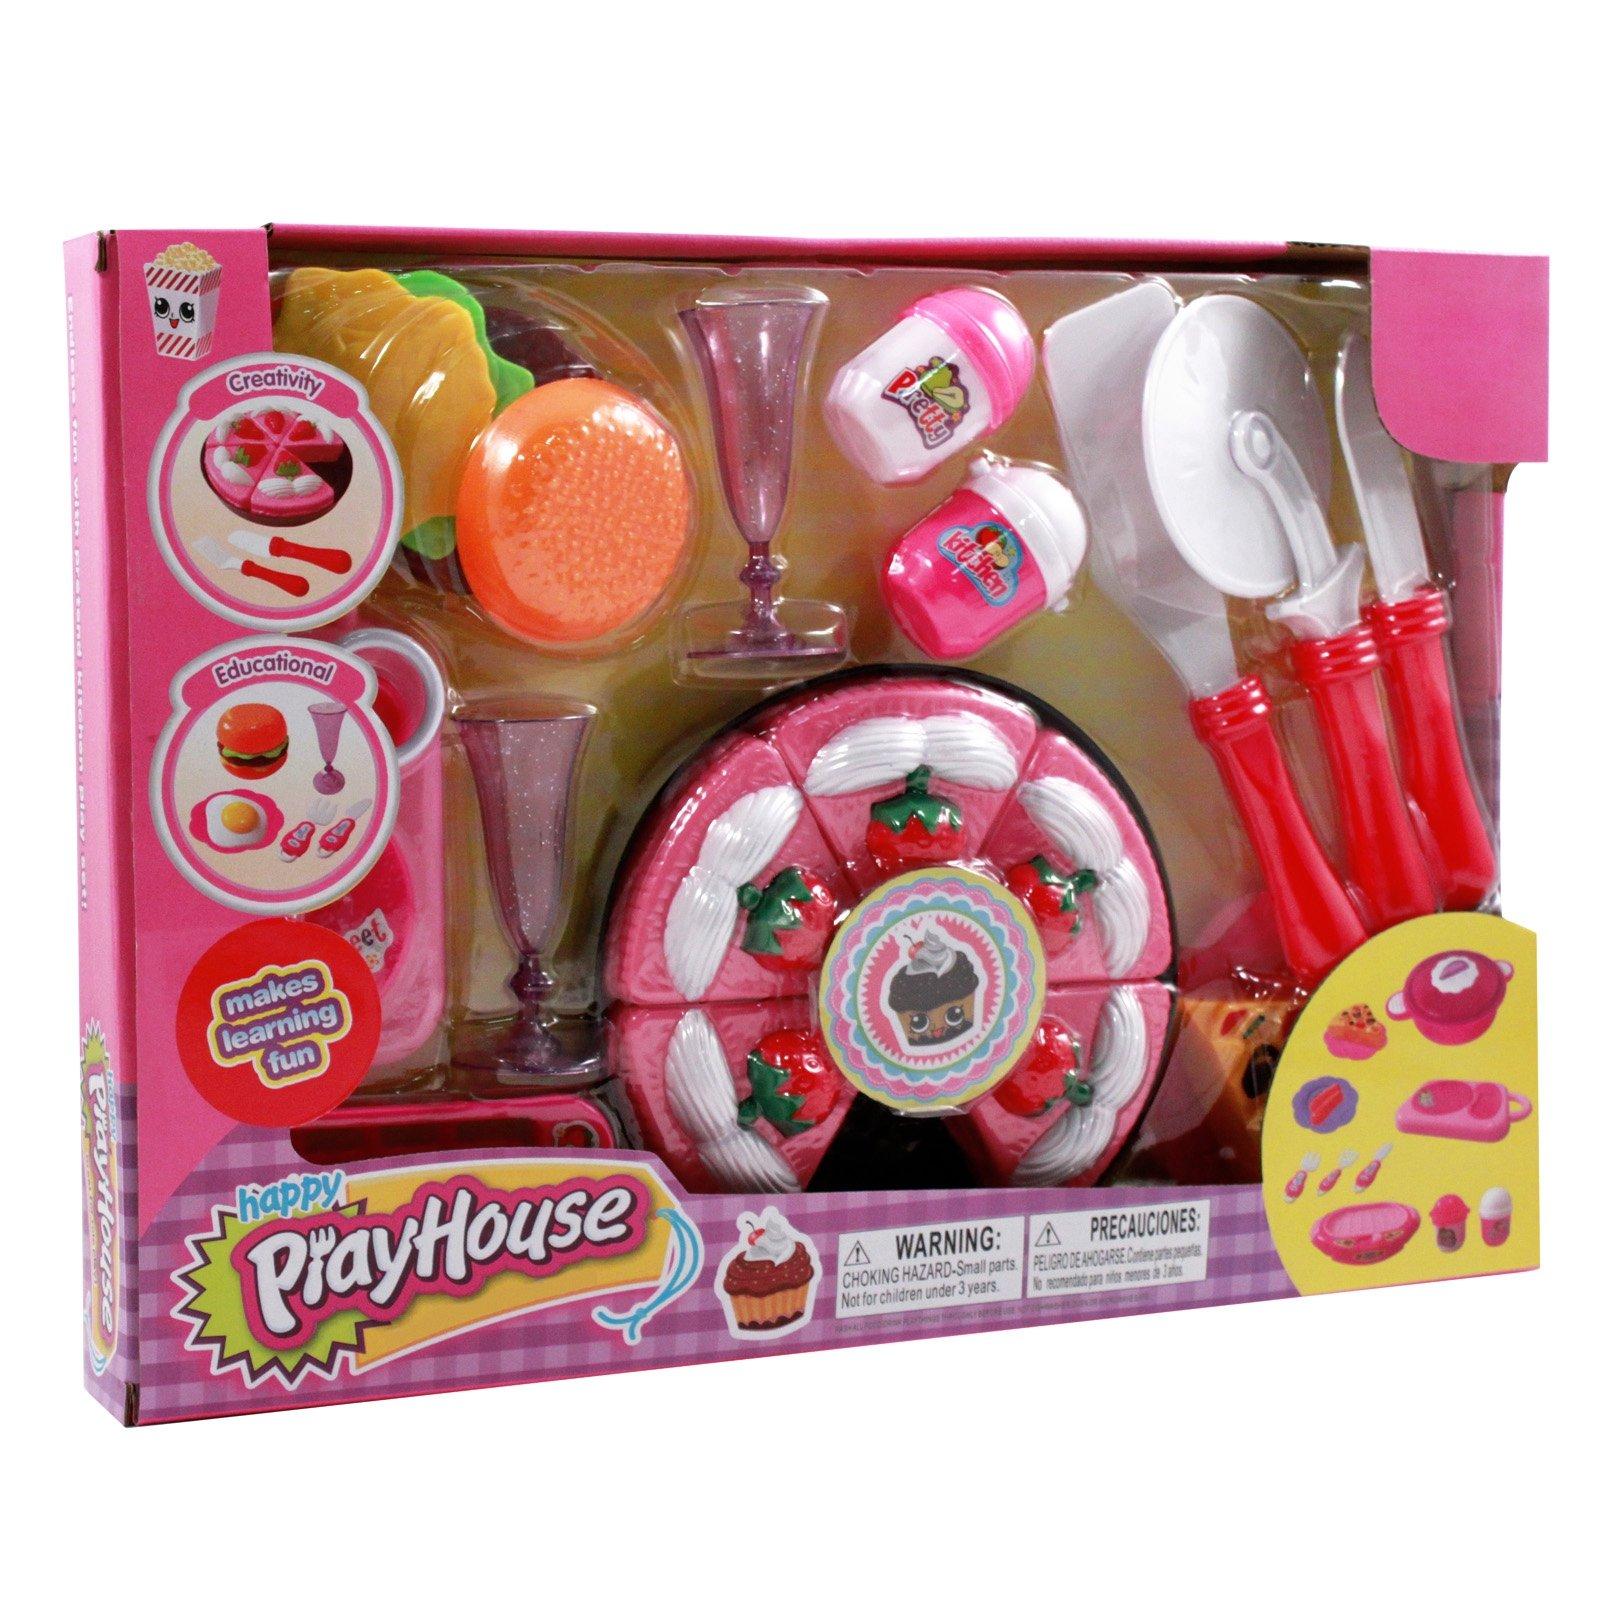 Kidfun Pretend Play Kitchen Playhouse Dessert Chef Pink Toy Set - Cake